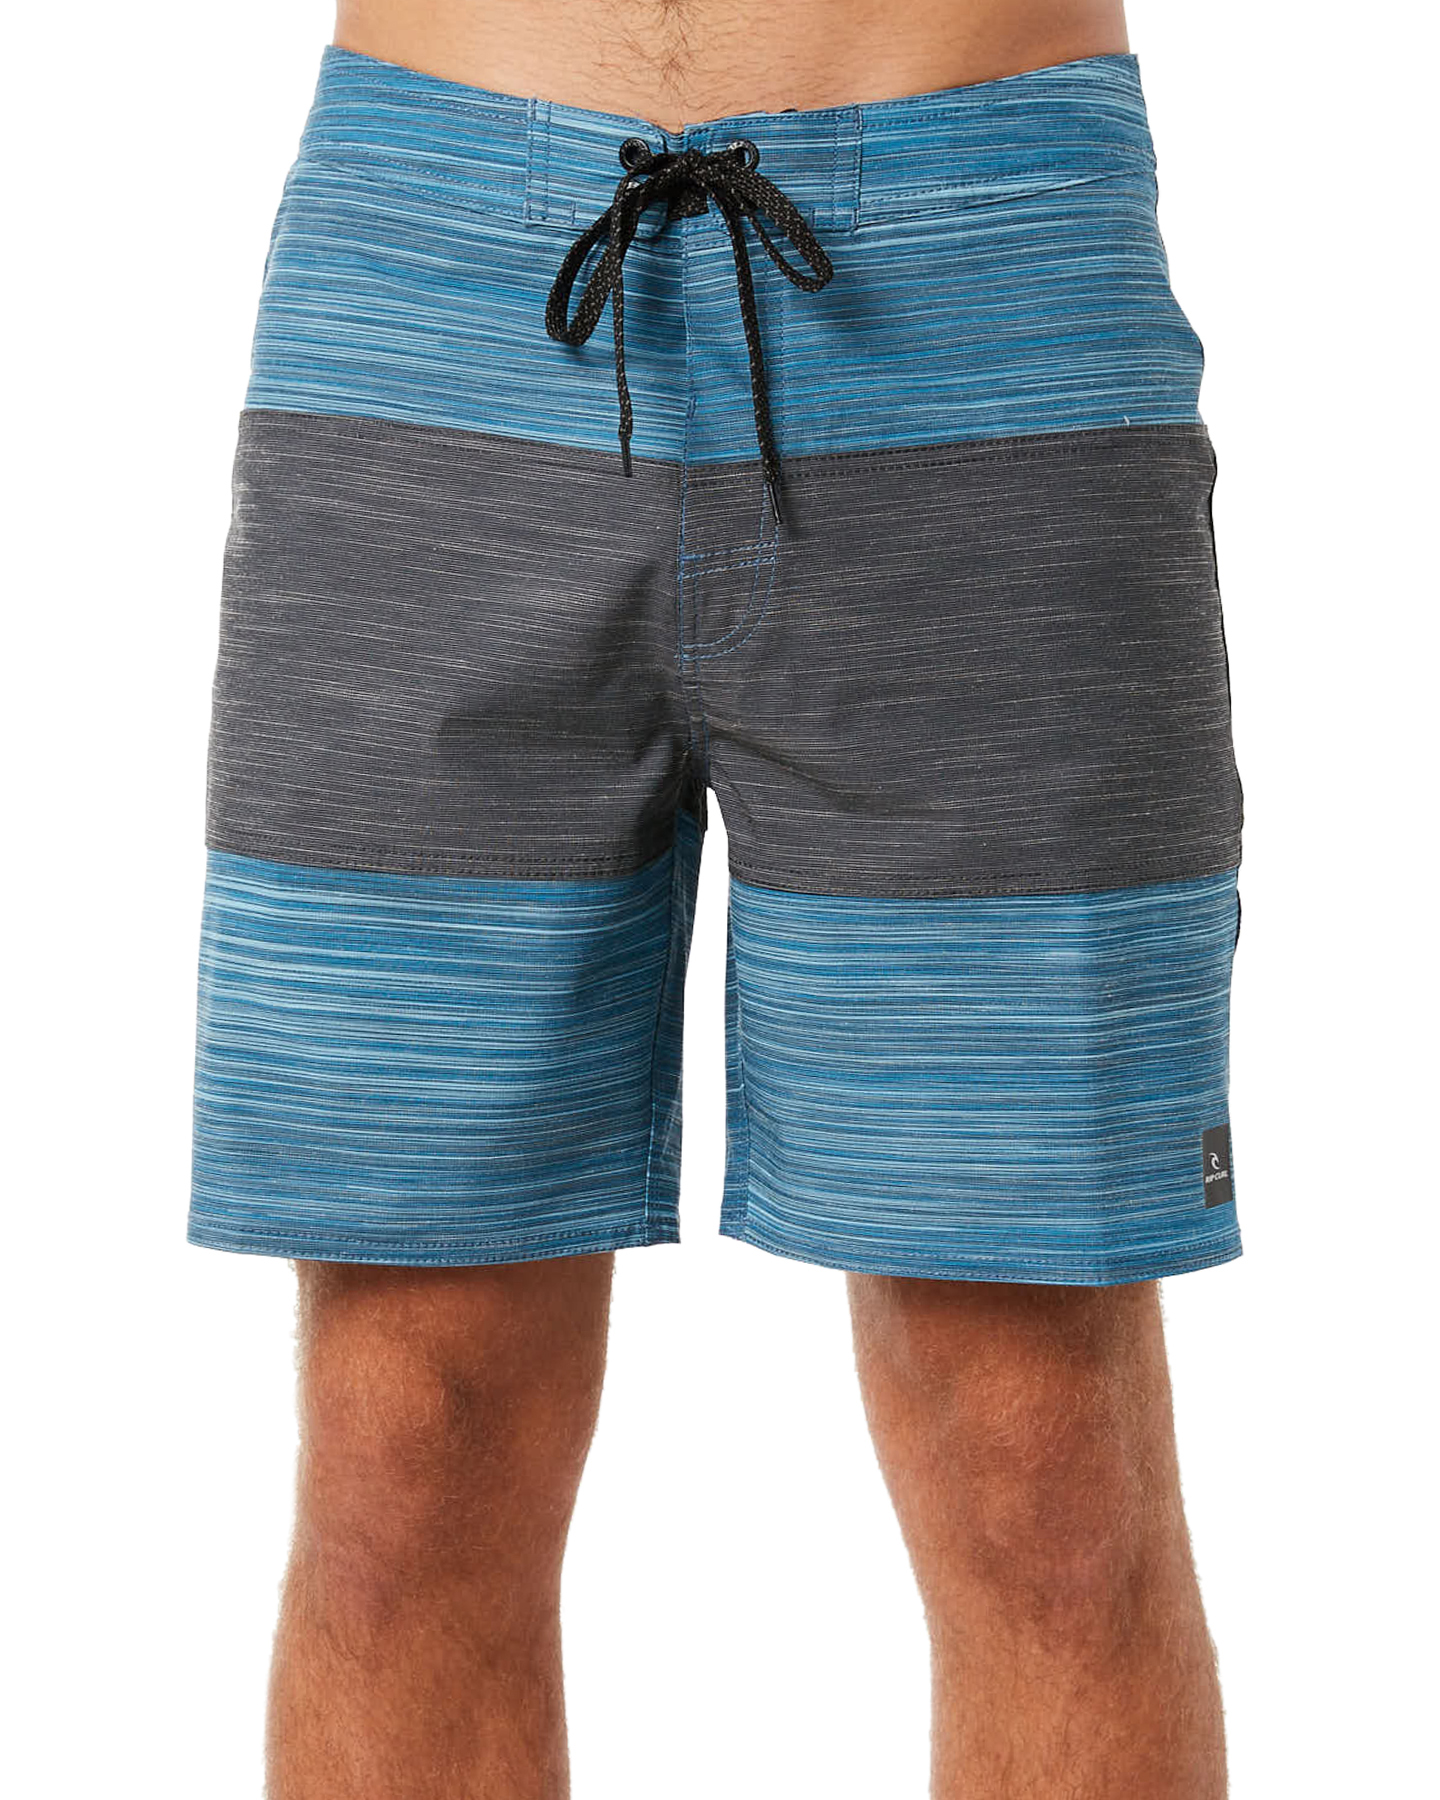 Rip Curl Mirage Wilko Splice 19 Mens Boardshort Blue Mens Boardies ... 6edbf901fe4